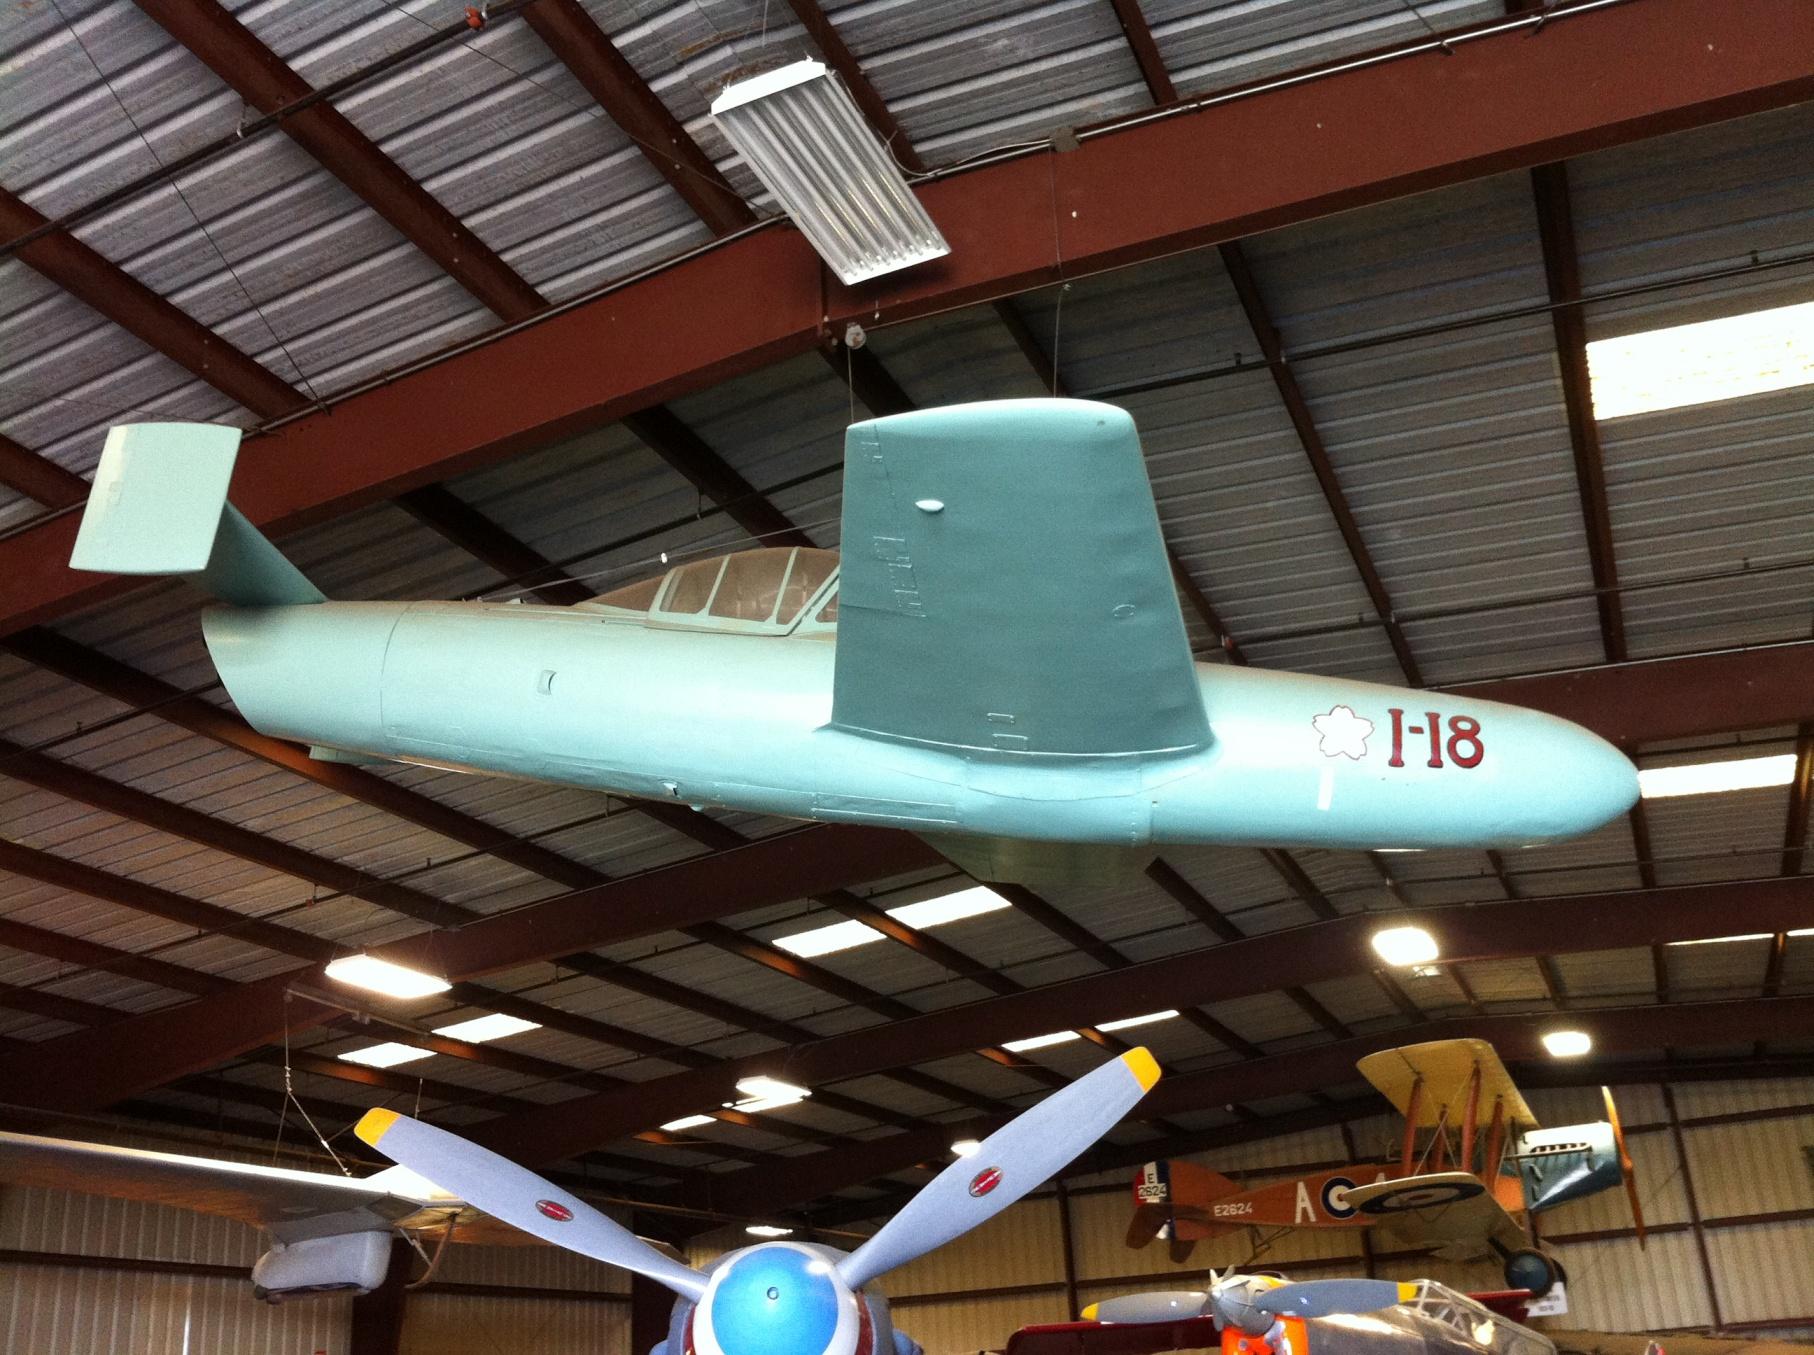 Ohka at Planes of Fame Museum, Chino, CA, November 2014 (Photo: Sarah Sundin)